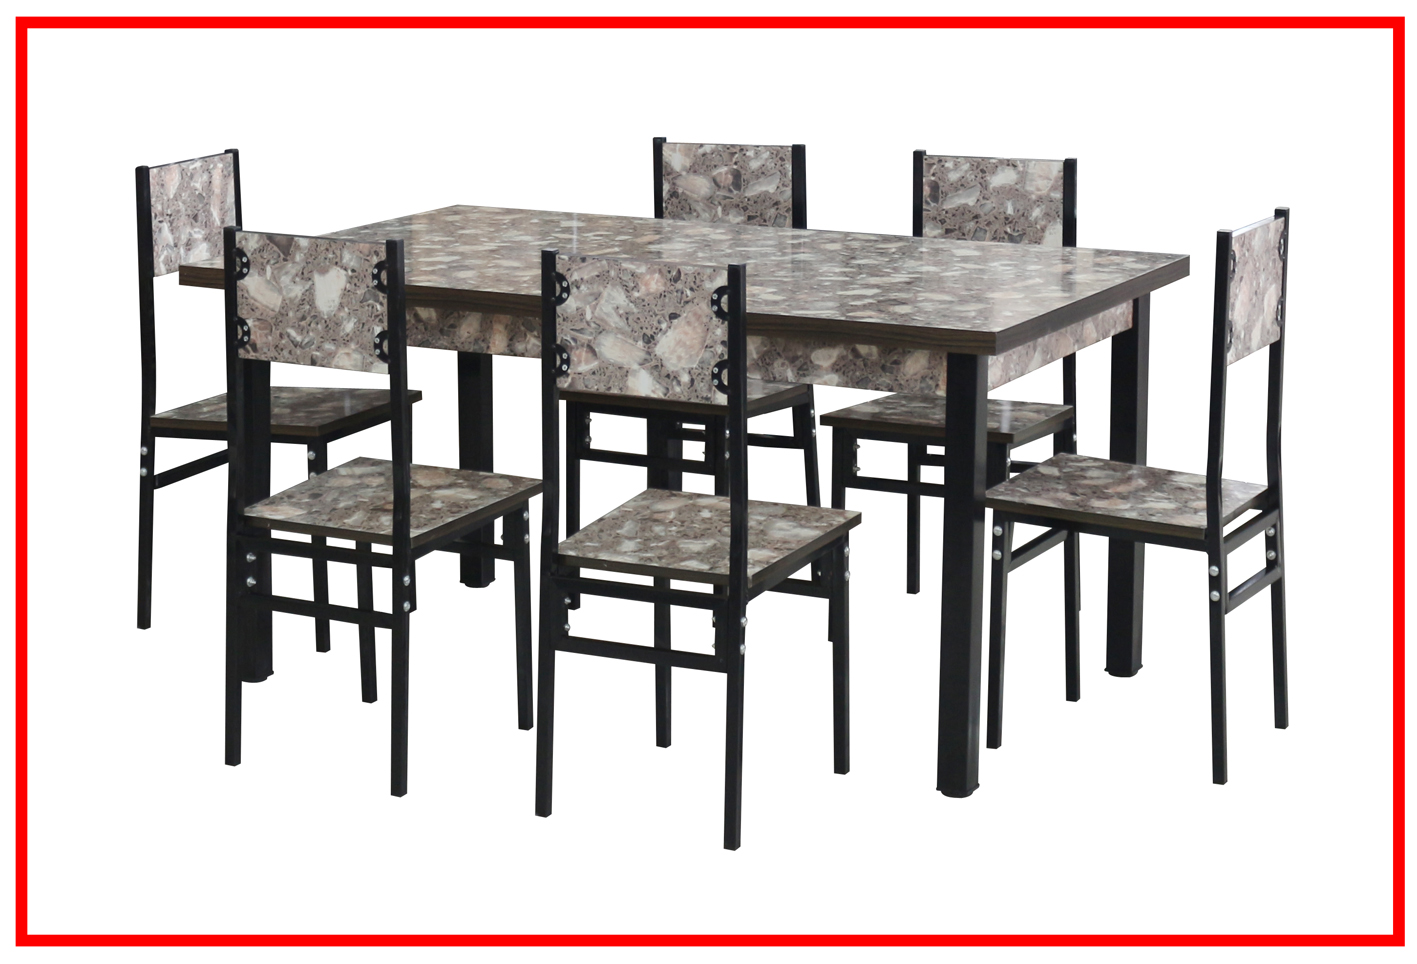 D196 Dining Set Image